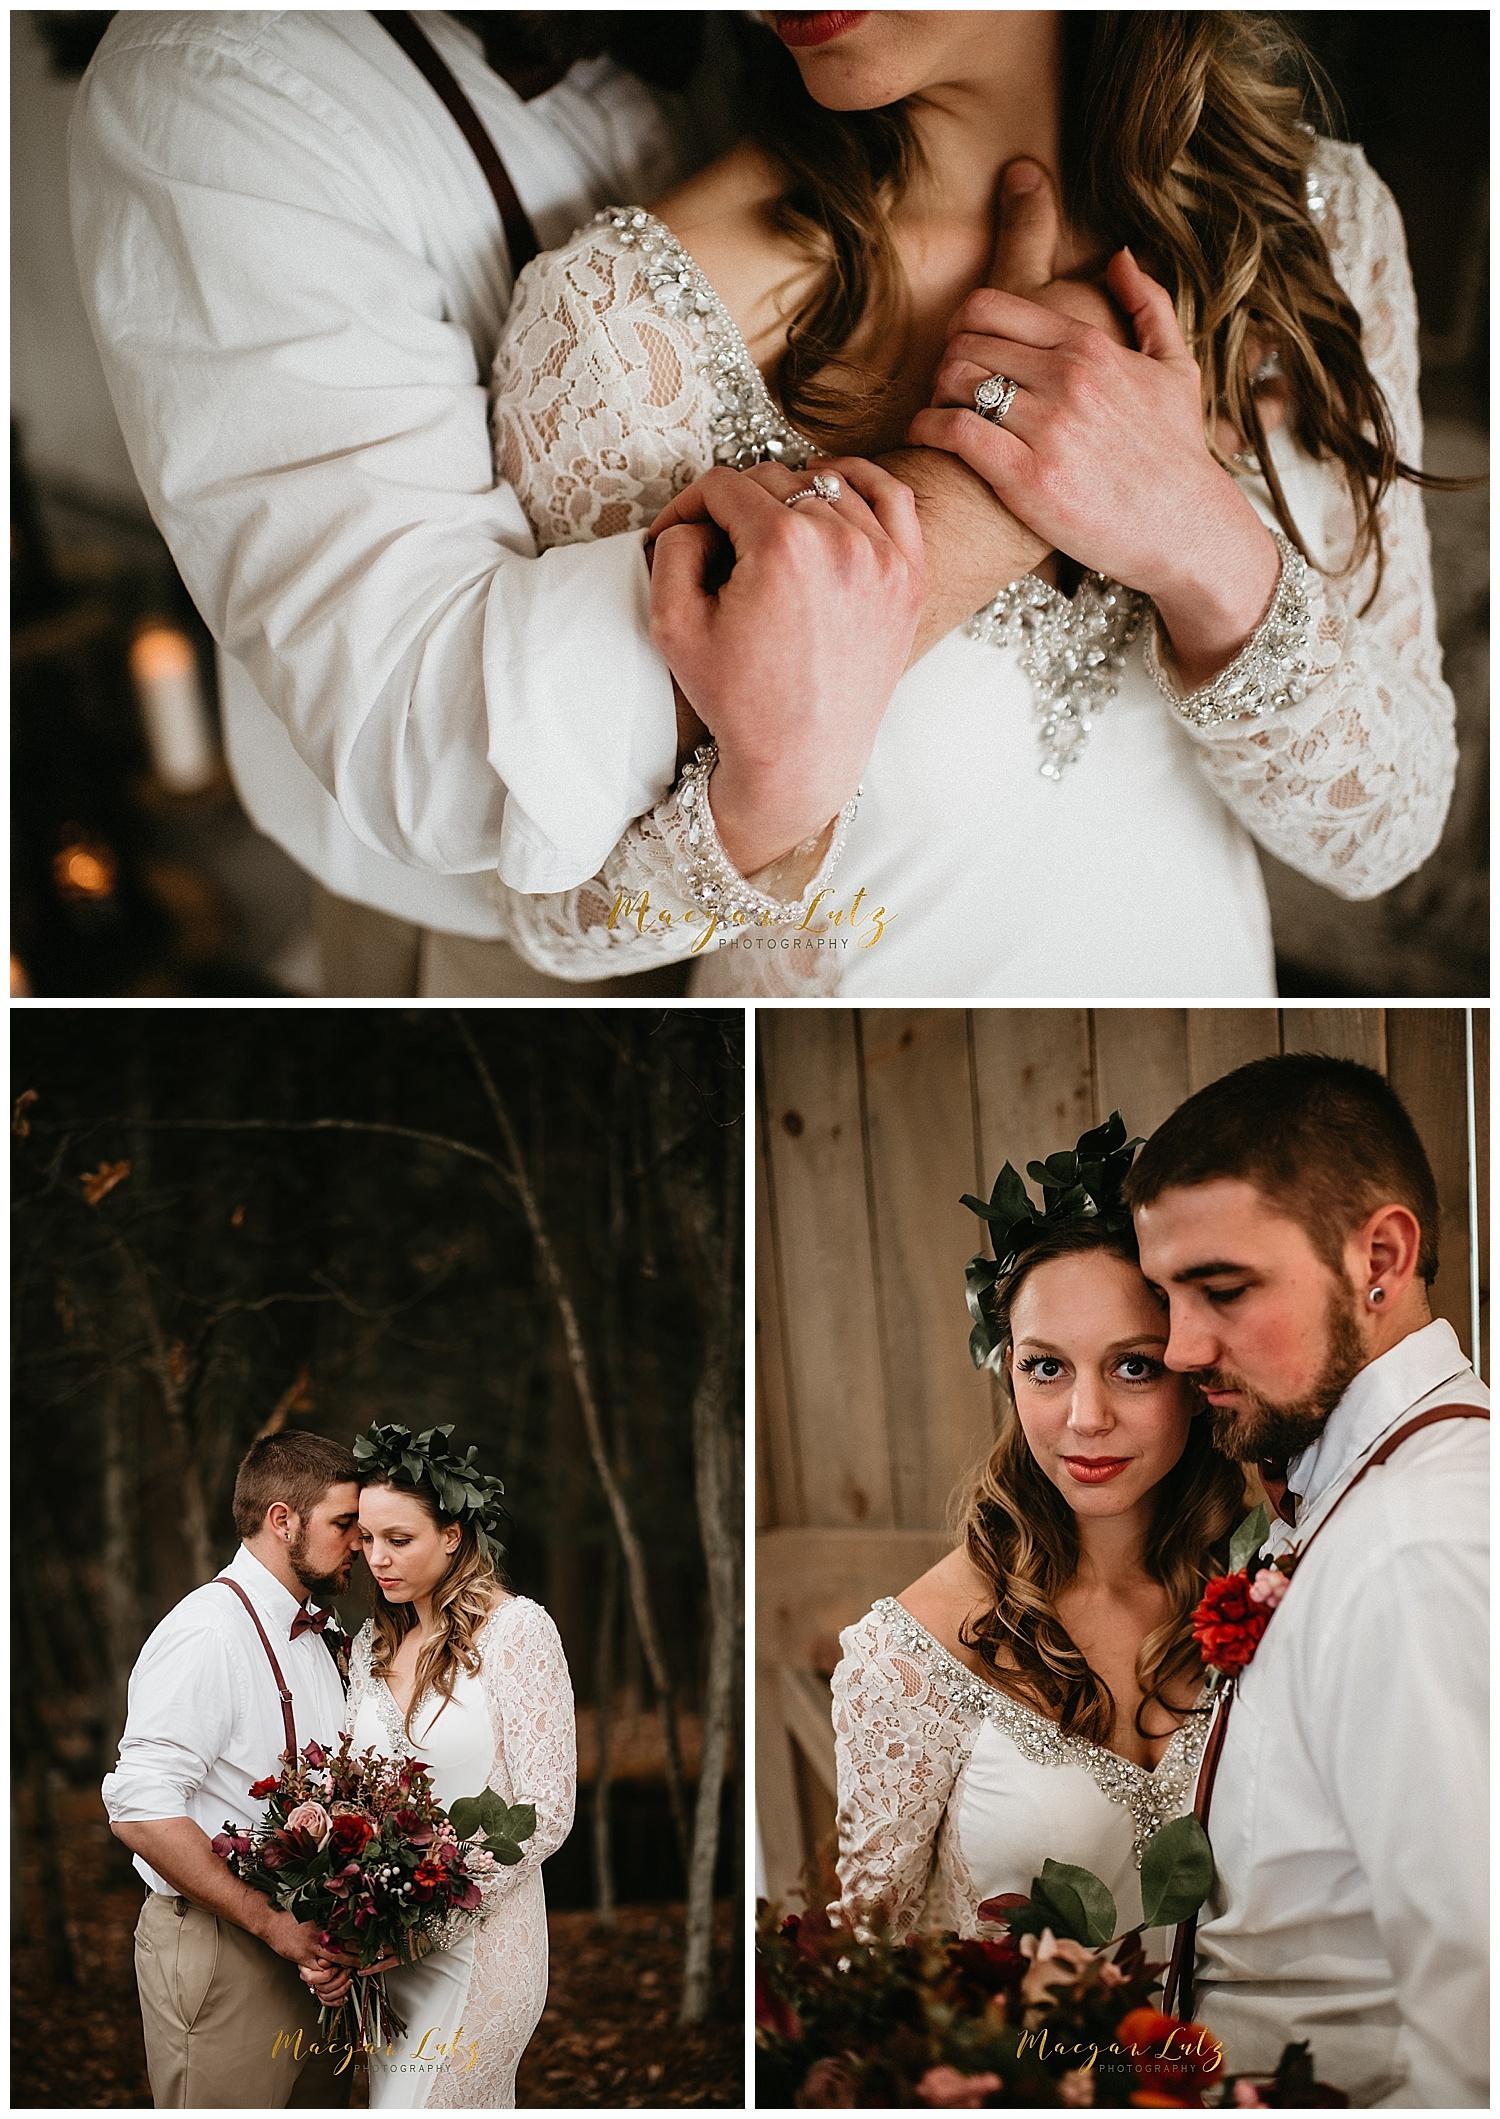 NEPA-wedding-engagement-photographer-whitewoods-weddings-venue-Wapwallopen-PA_0075.jpg